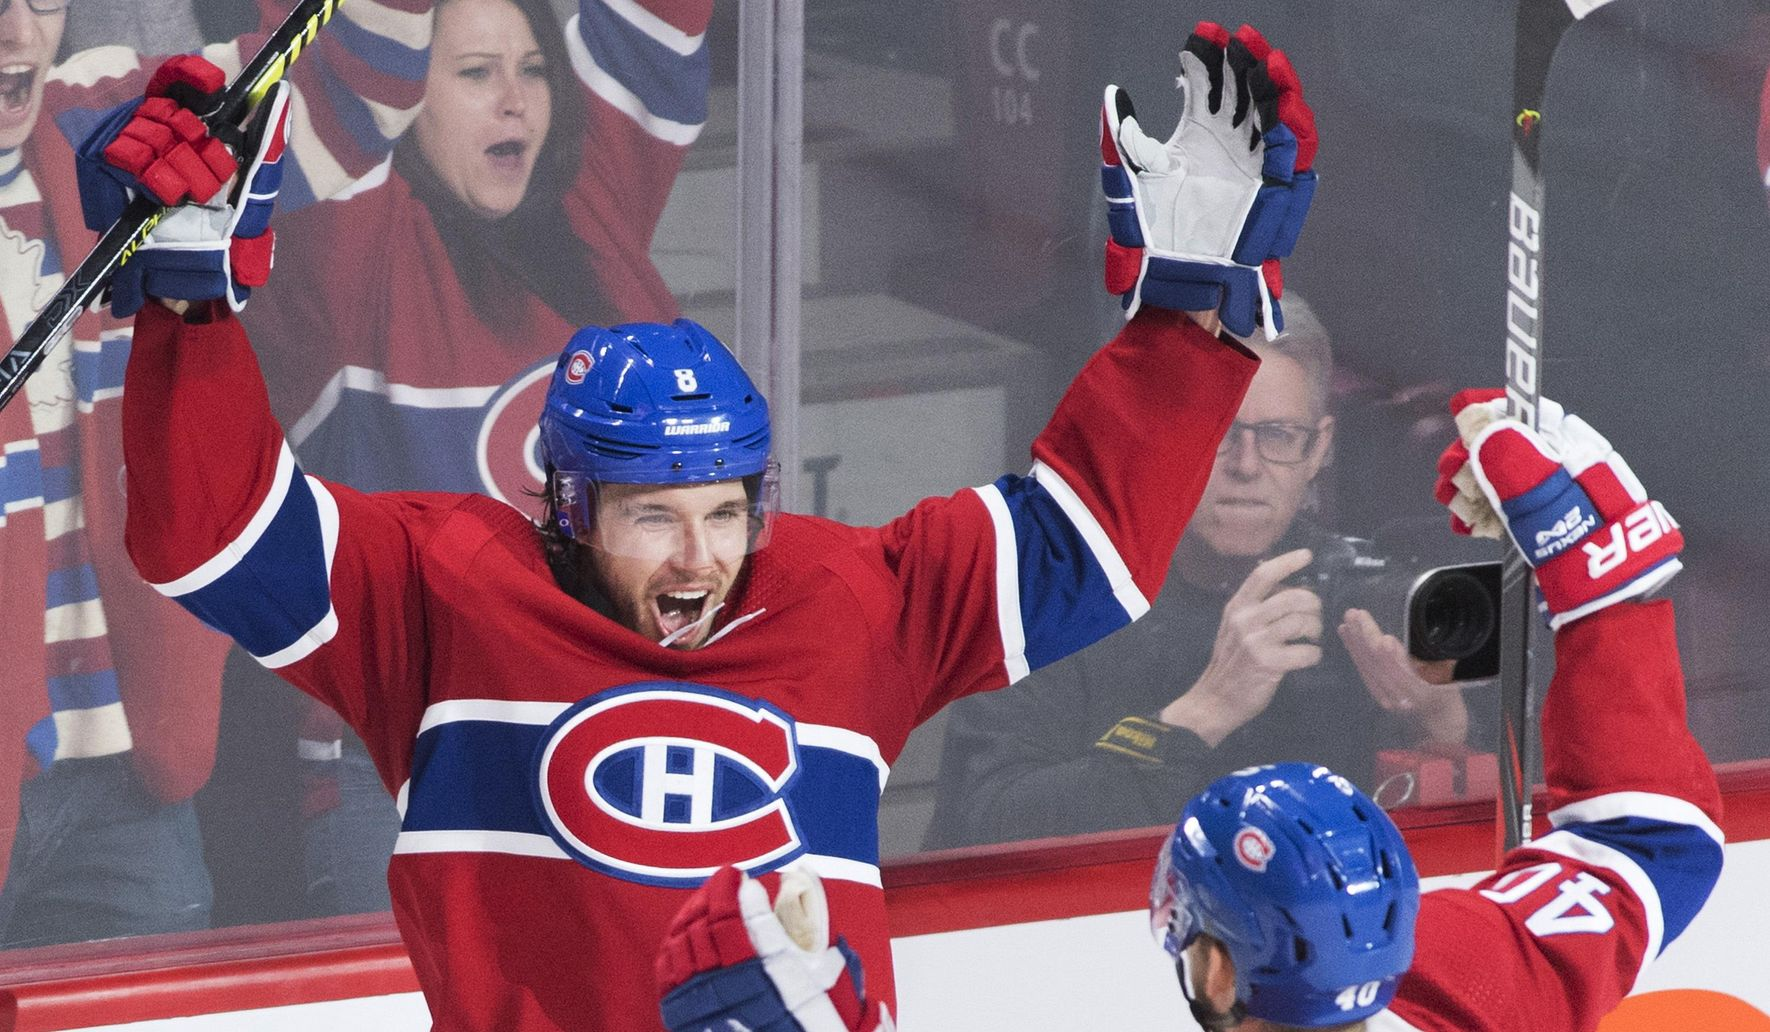 Senators_canadiens_hockey_02351_c0-166-3000-1915_s1770x1032